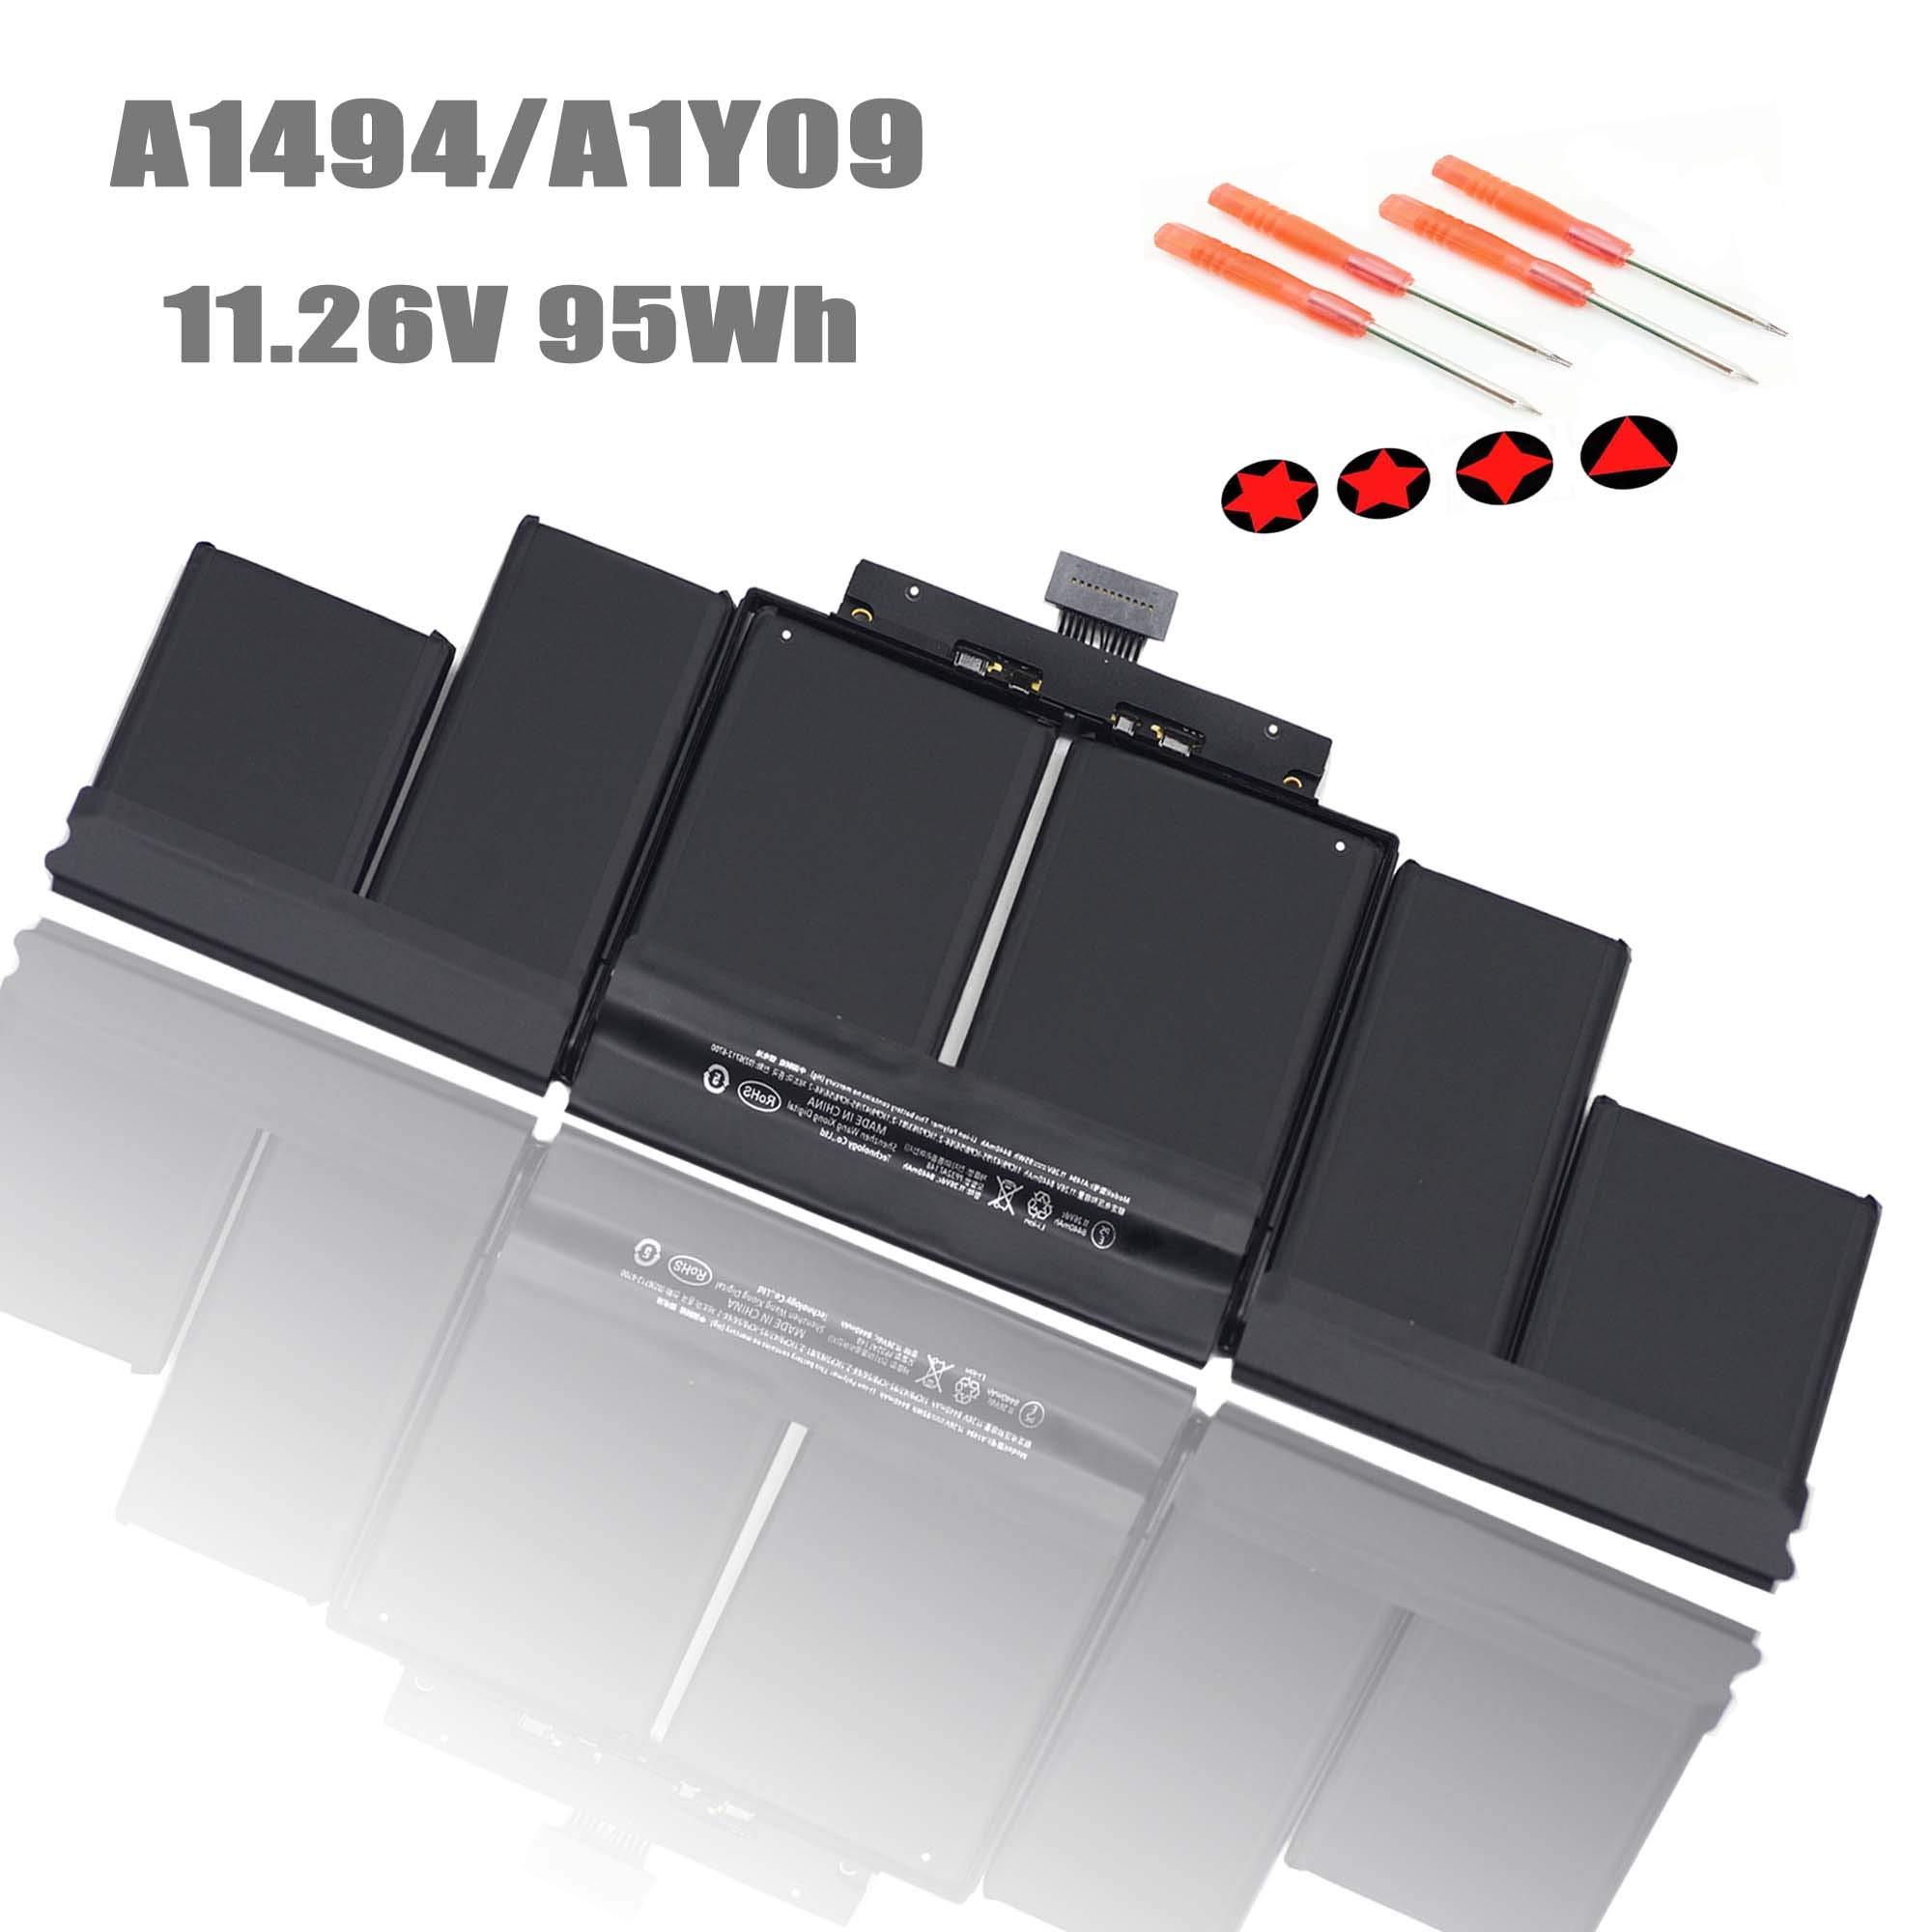 Bateria A1494 11.26V 95Wh MacBook Pro 15 A1494 A1398 Retina